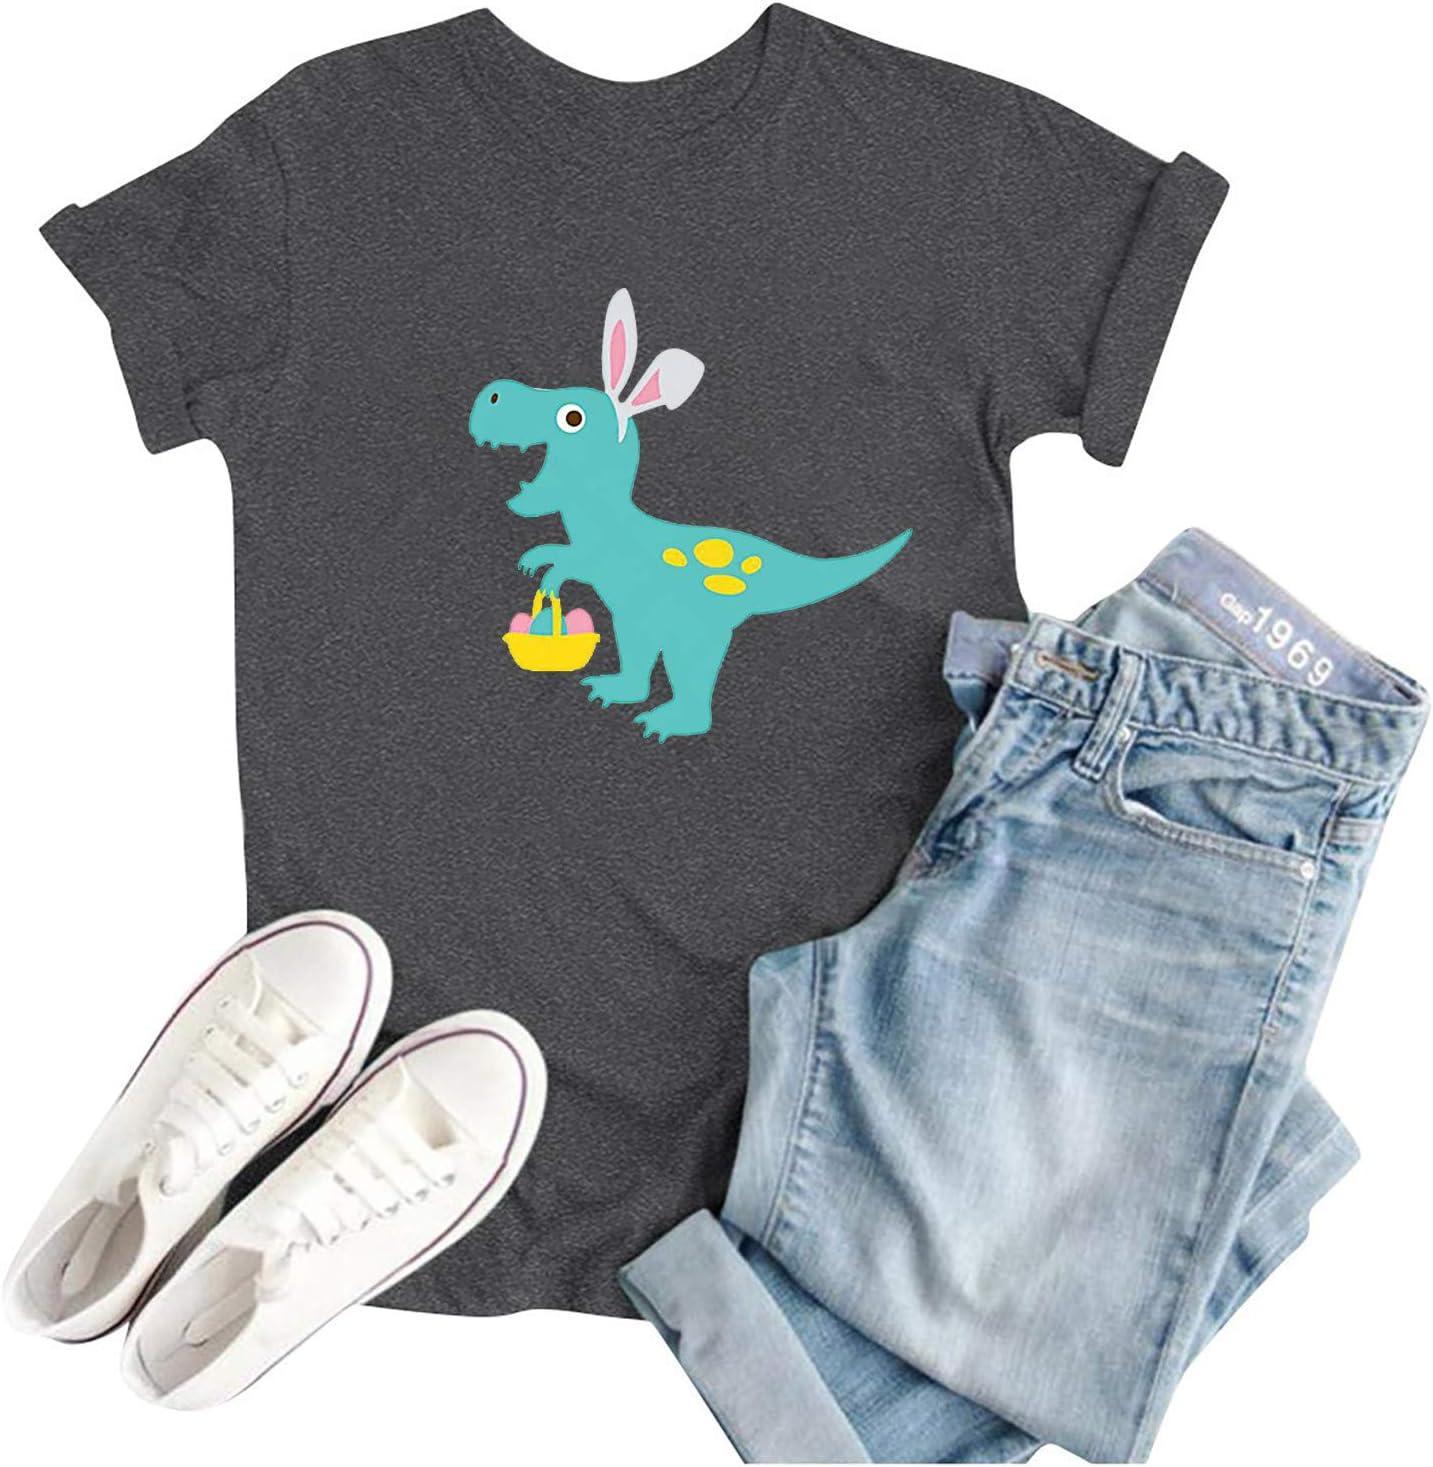 Missli Easter Shirts for Women, Cartoon Dinosaur Print Short Sle